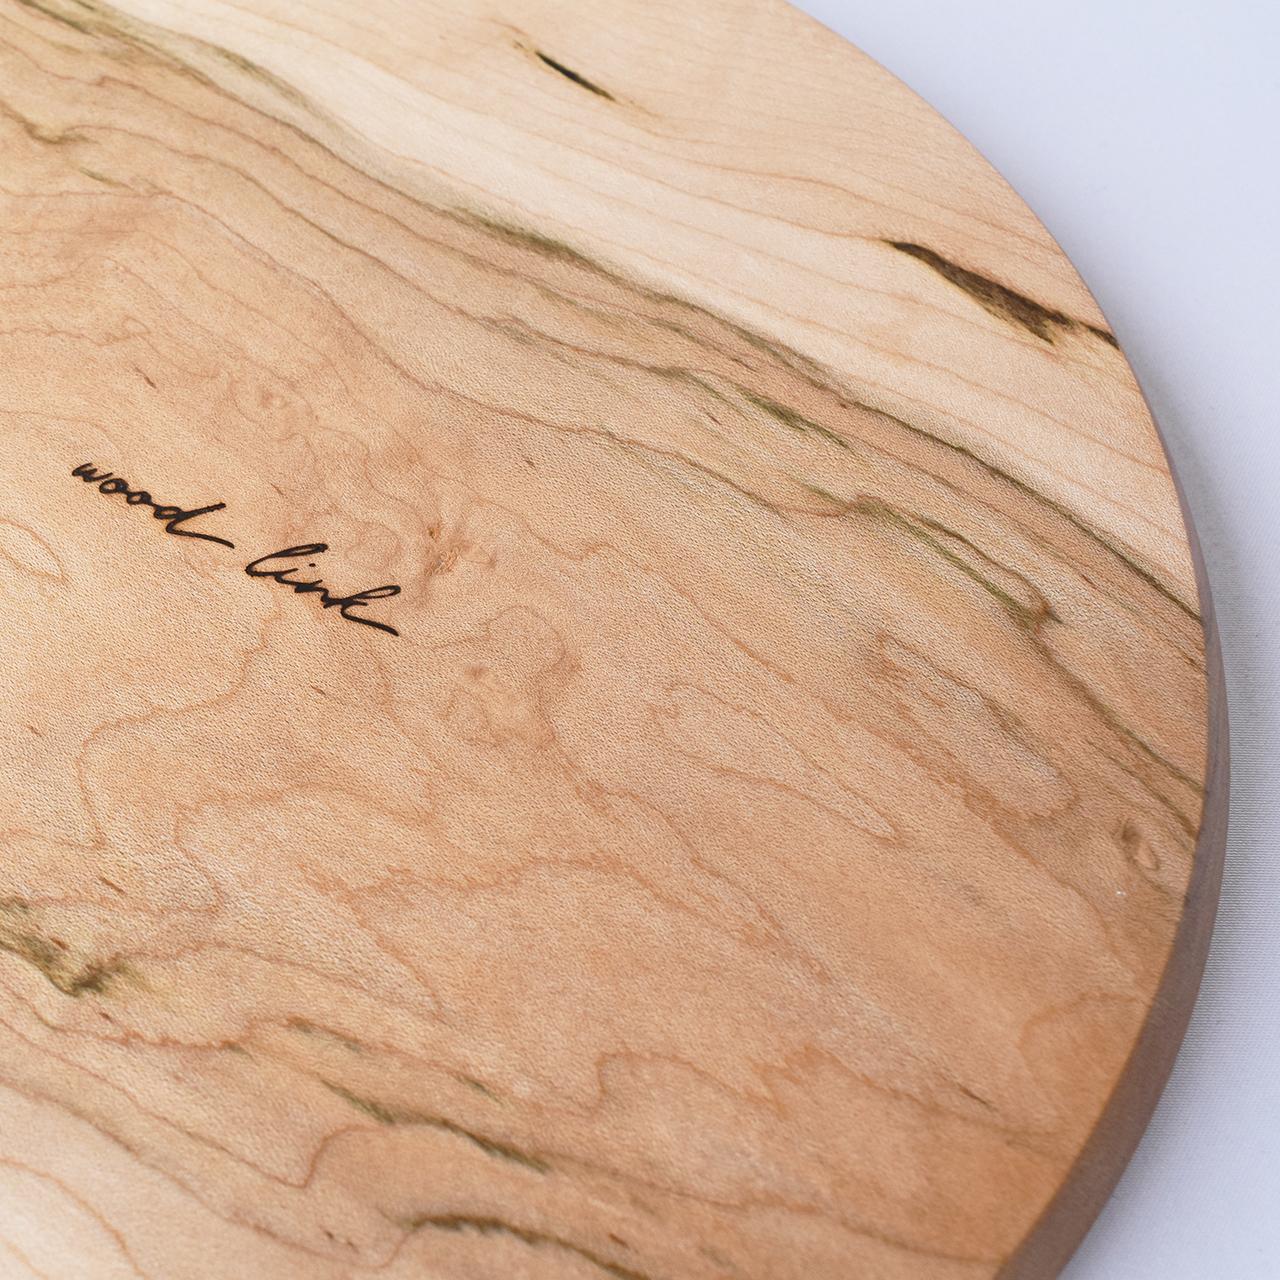 Cutting Board itayakaede